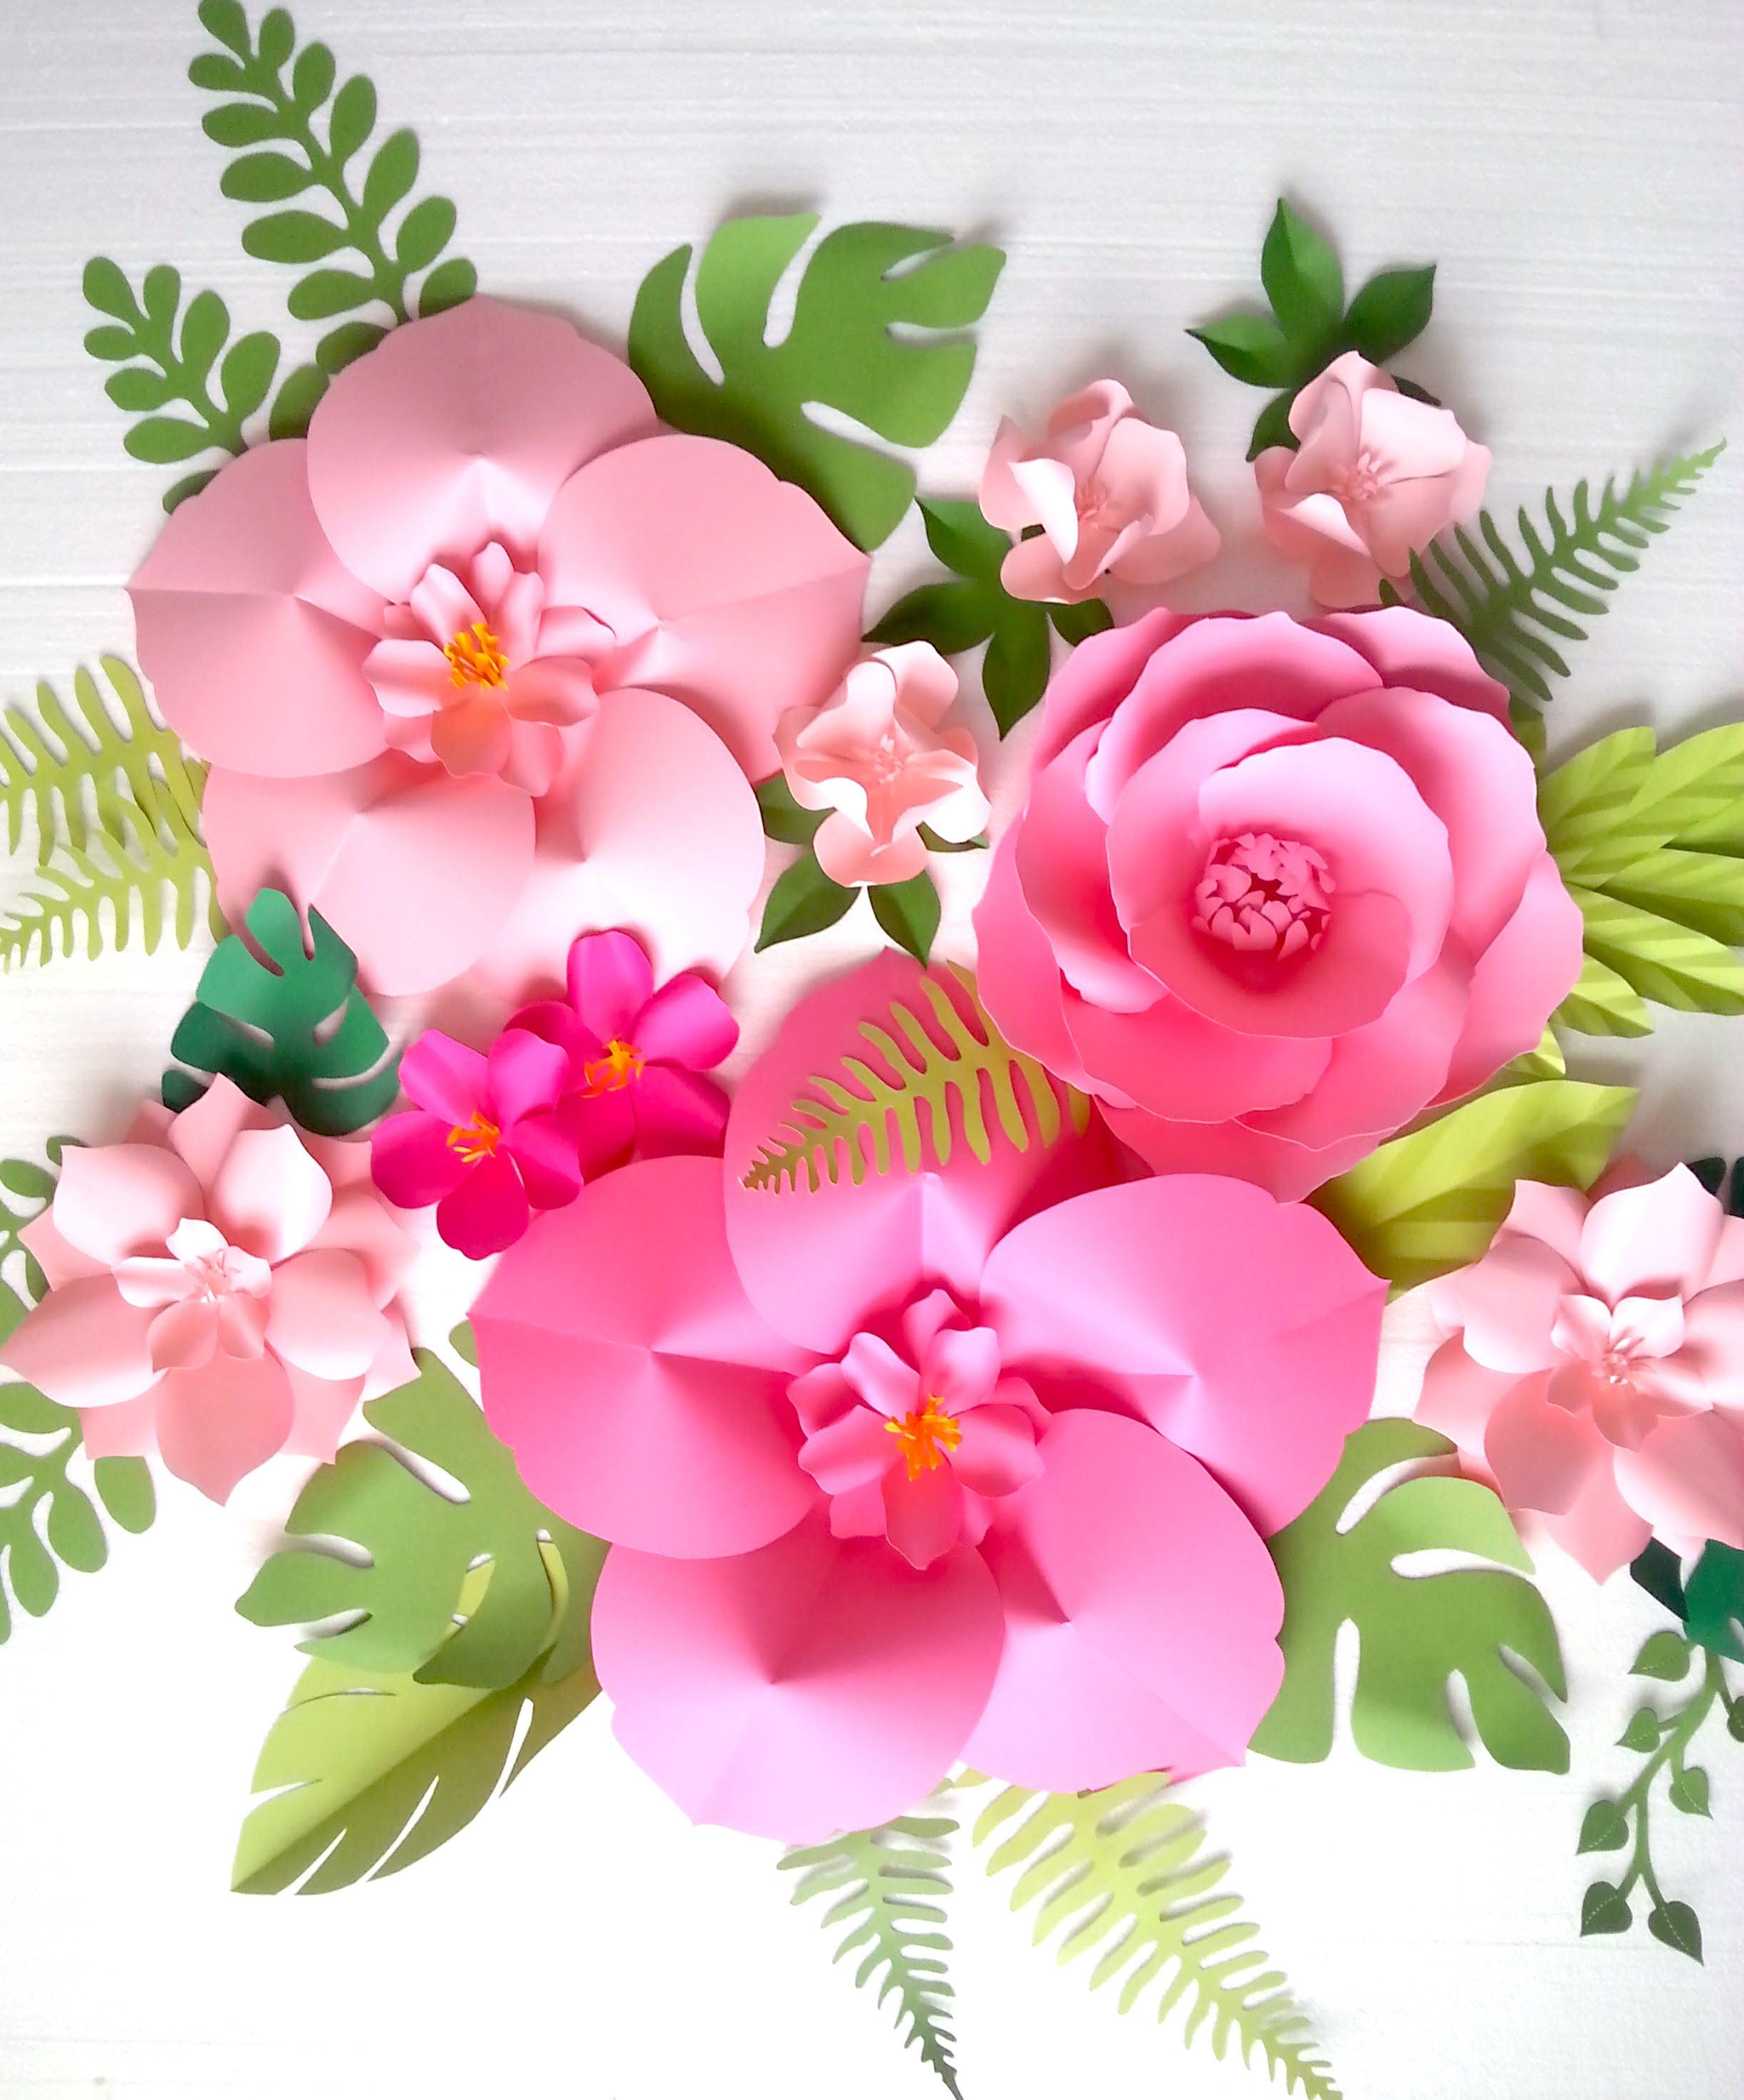 Extra Large Paper Flower Backdrop  Nursery  Room  Event Decor